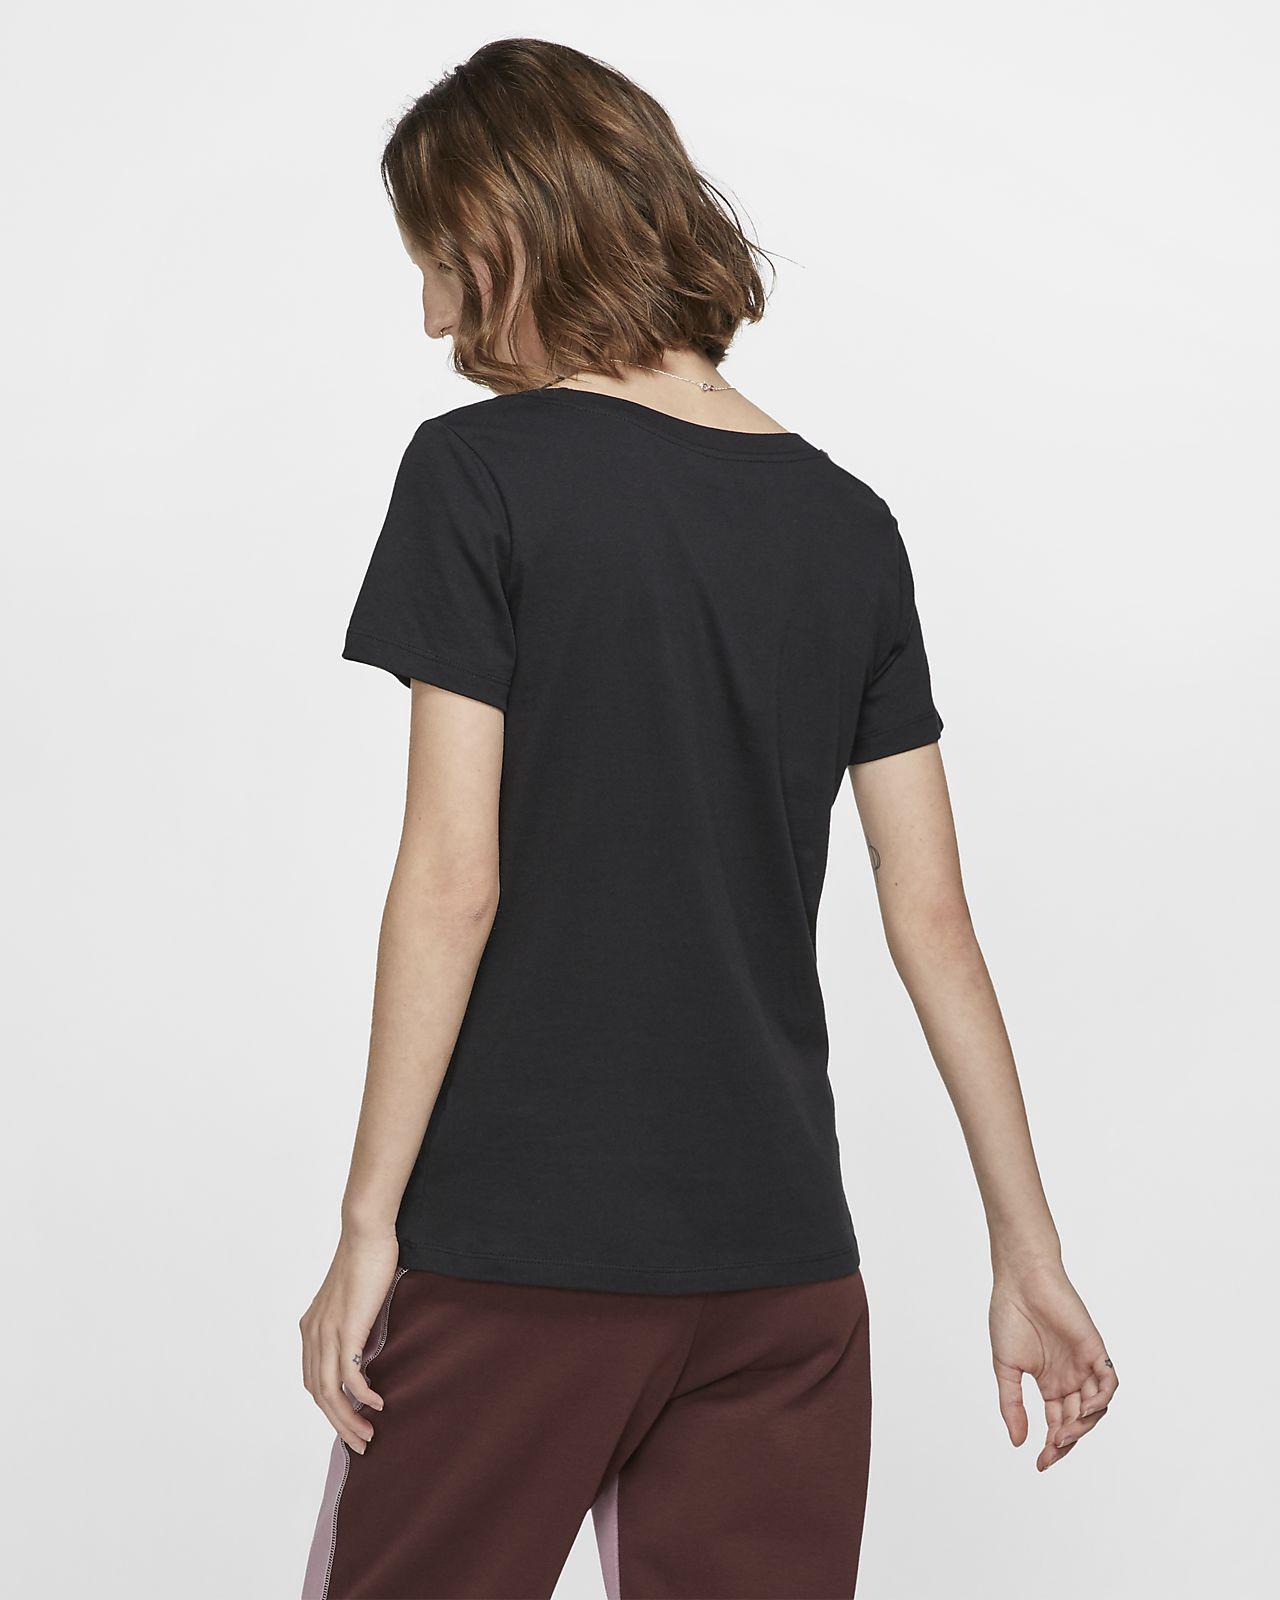 8ffd9772 Nike Sportswear Women's T-Shirt. Nike.com AE